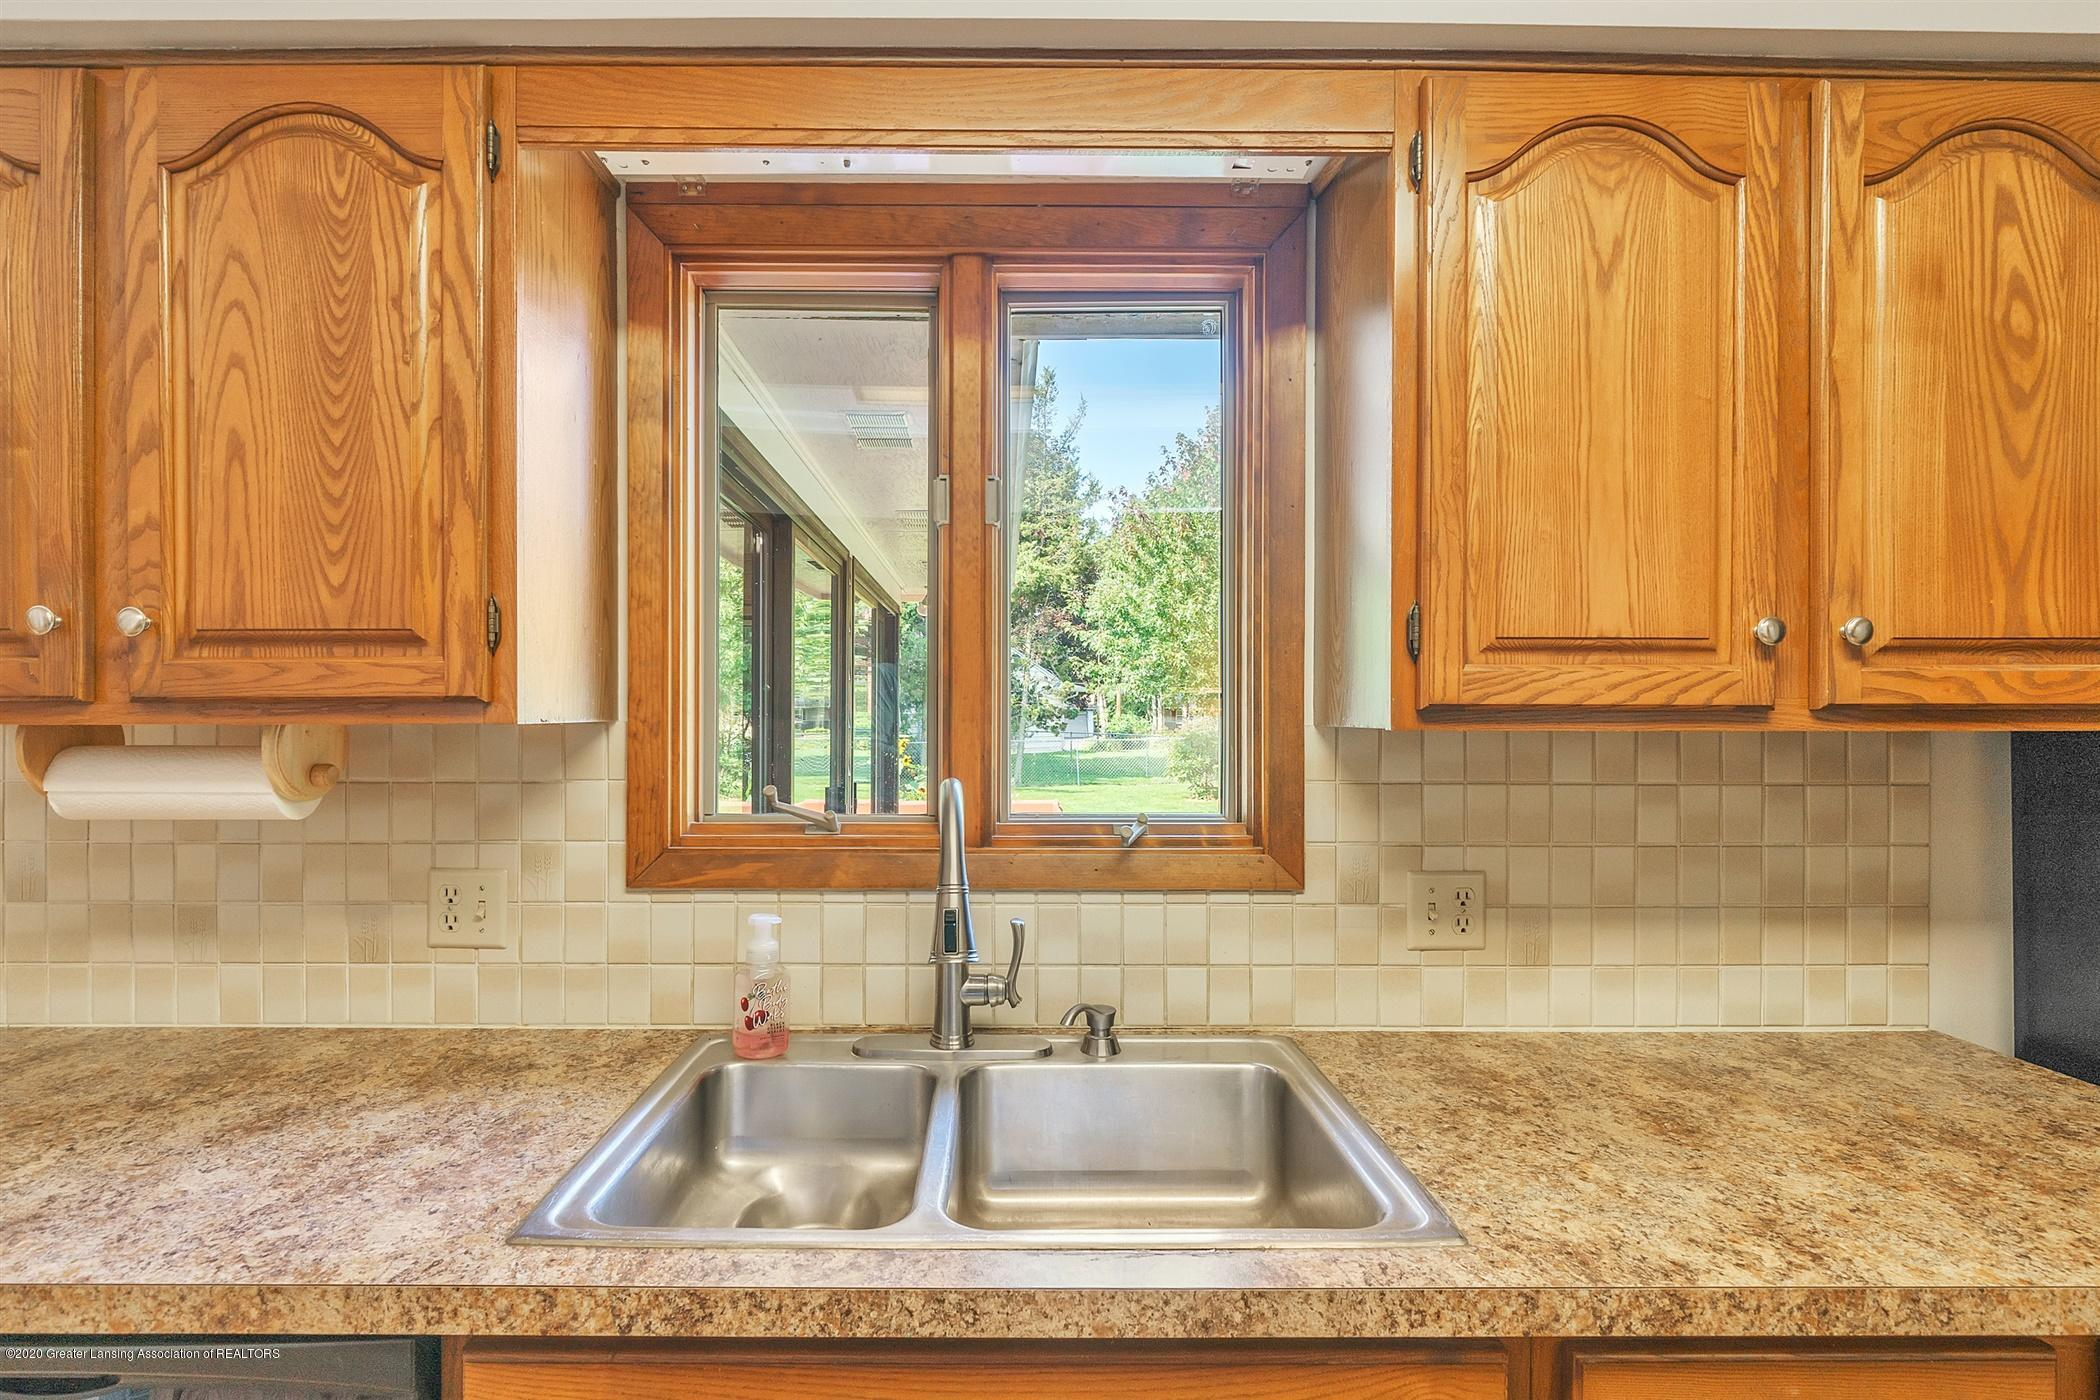 4557 Seneca Dr - (12) MAIN FLOOR Kitchen - 12